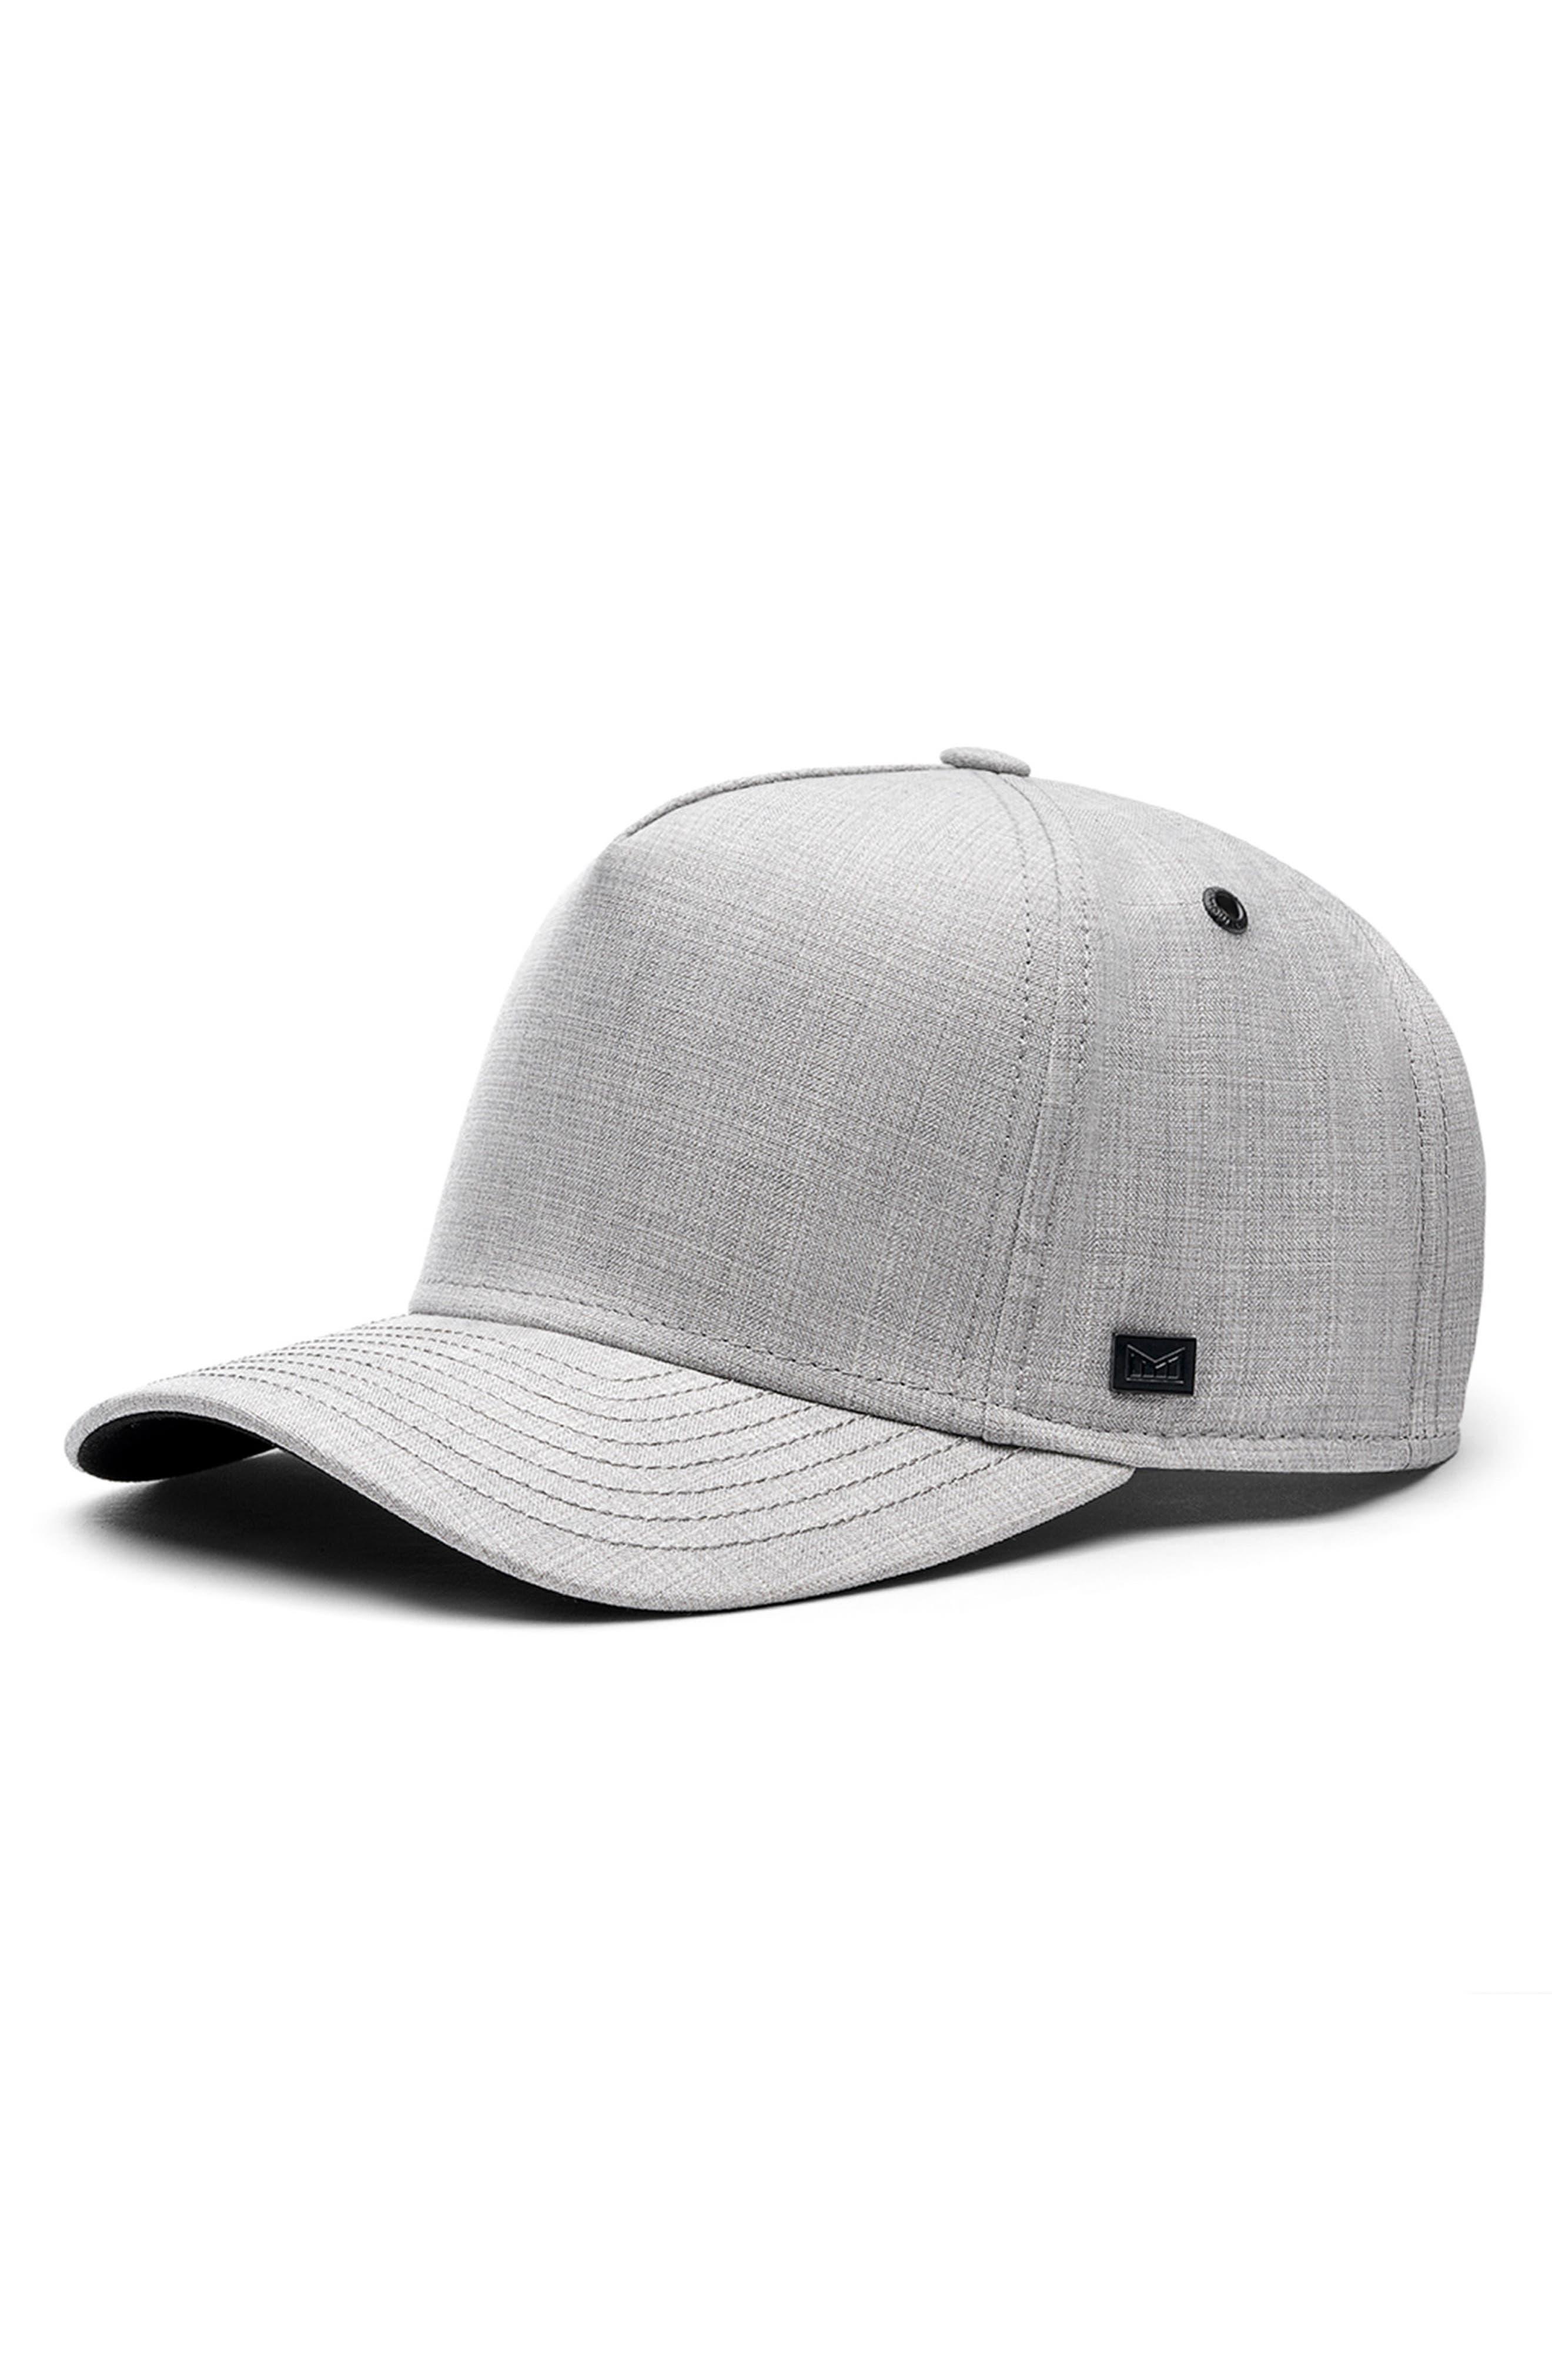 Odyssey Baseball Cap,                             Main thumbnail 1, color,                             Light Grey